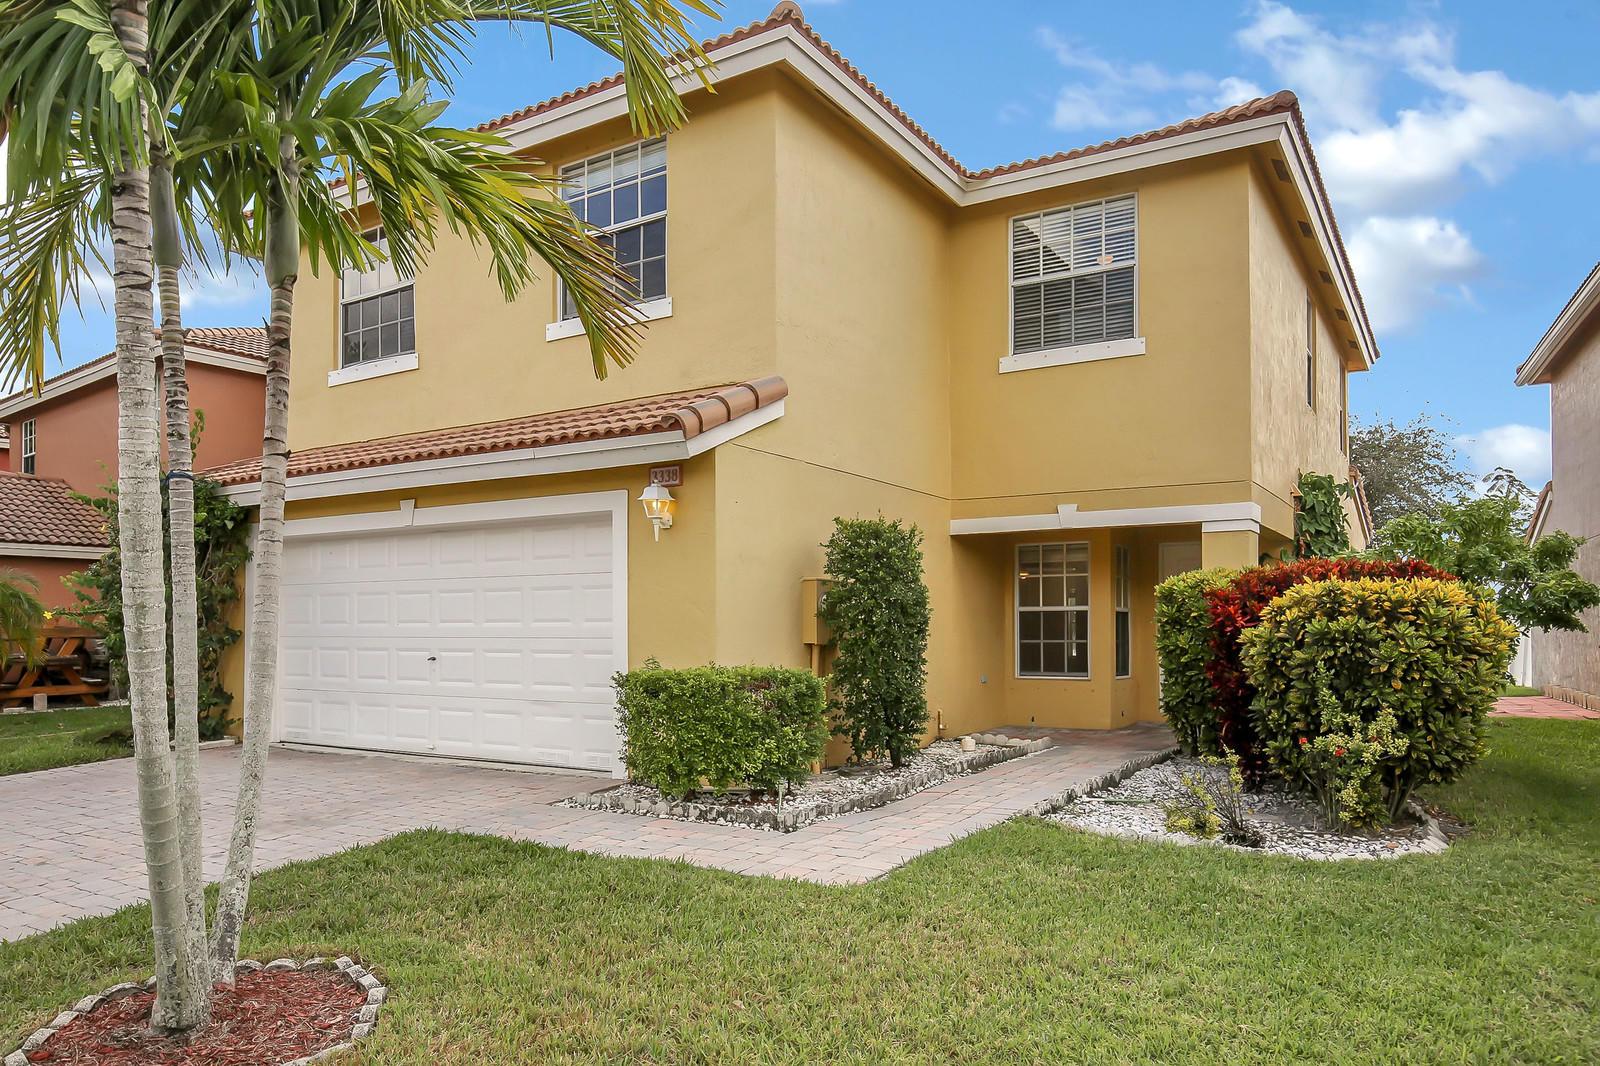 3338 Turtle Cove, West Palm Beach, FL 33411